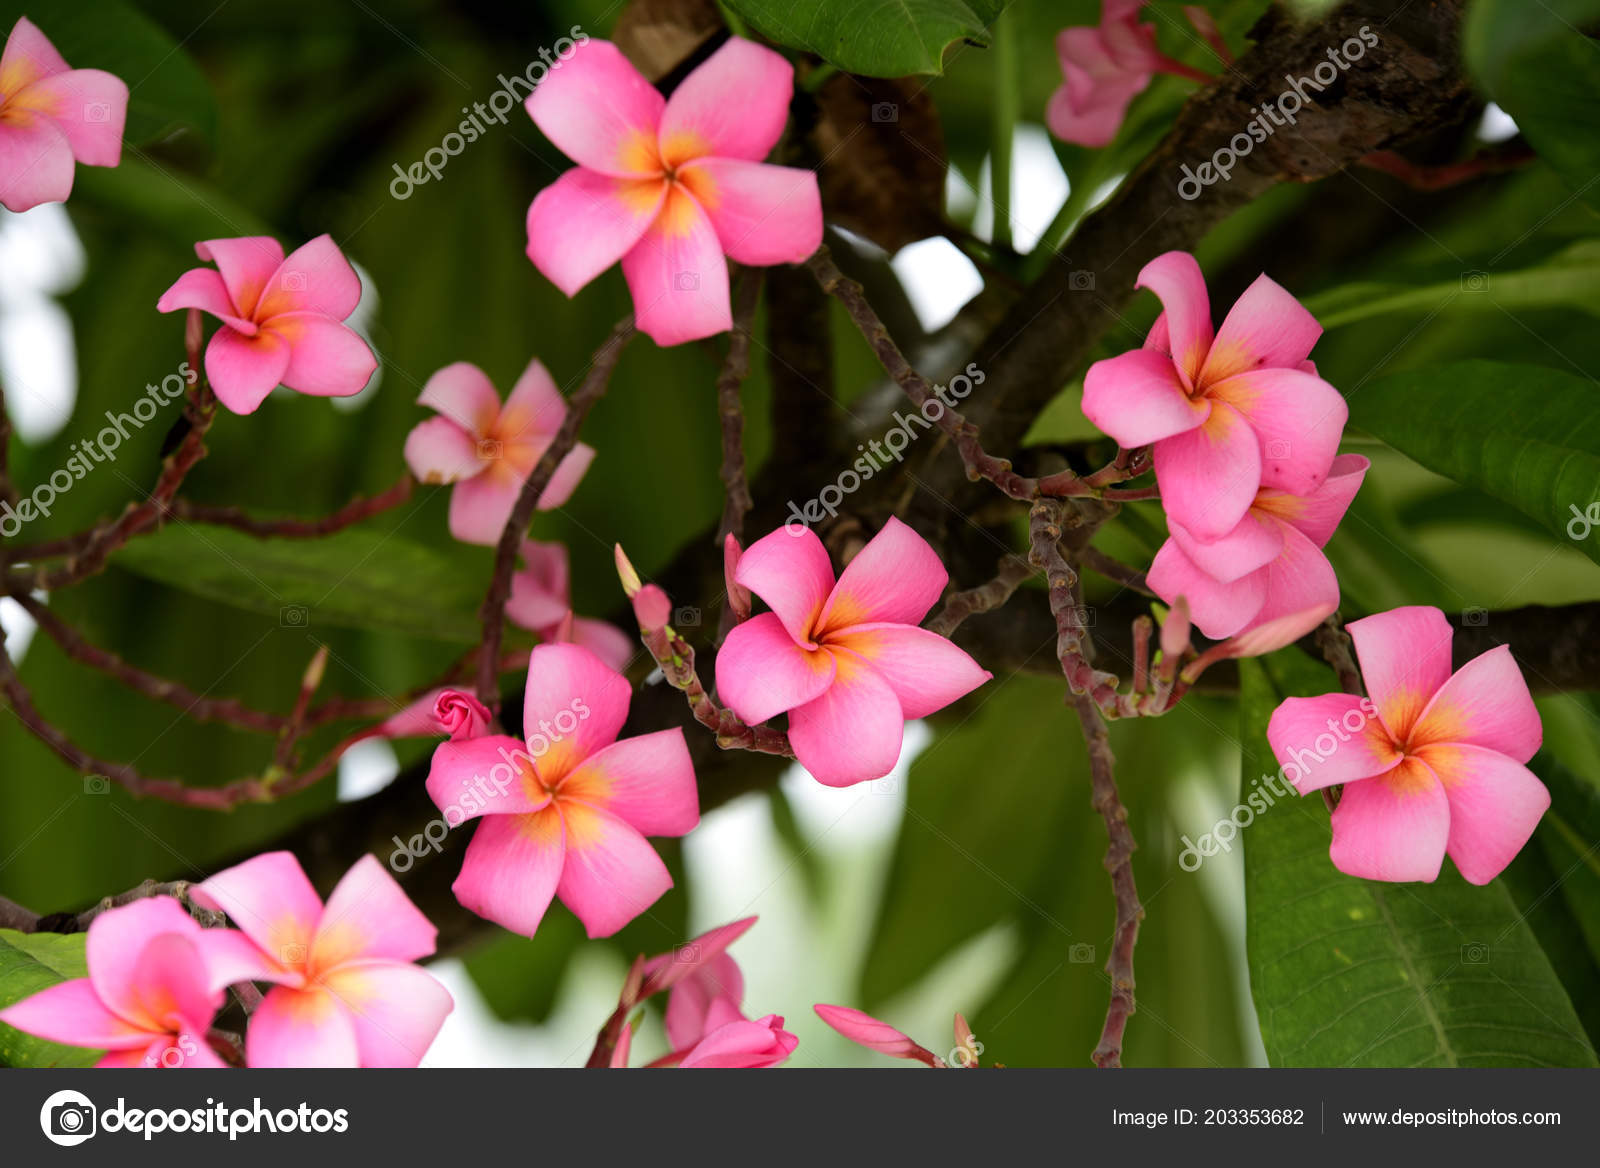 Colorful flowers garden plumeria flower blooming beautiful flowers colorful flowers garden plumeria flower blooming beautiful flowers garden blooming stock photo izmirmasajfo